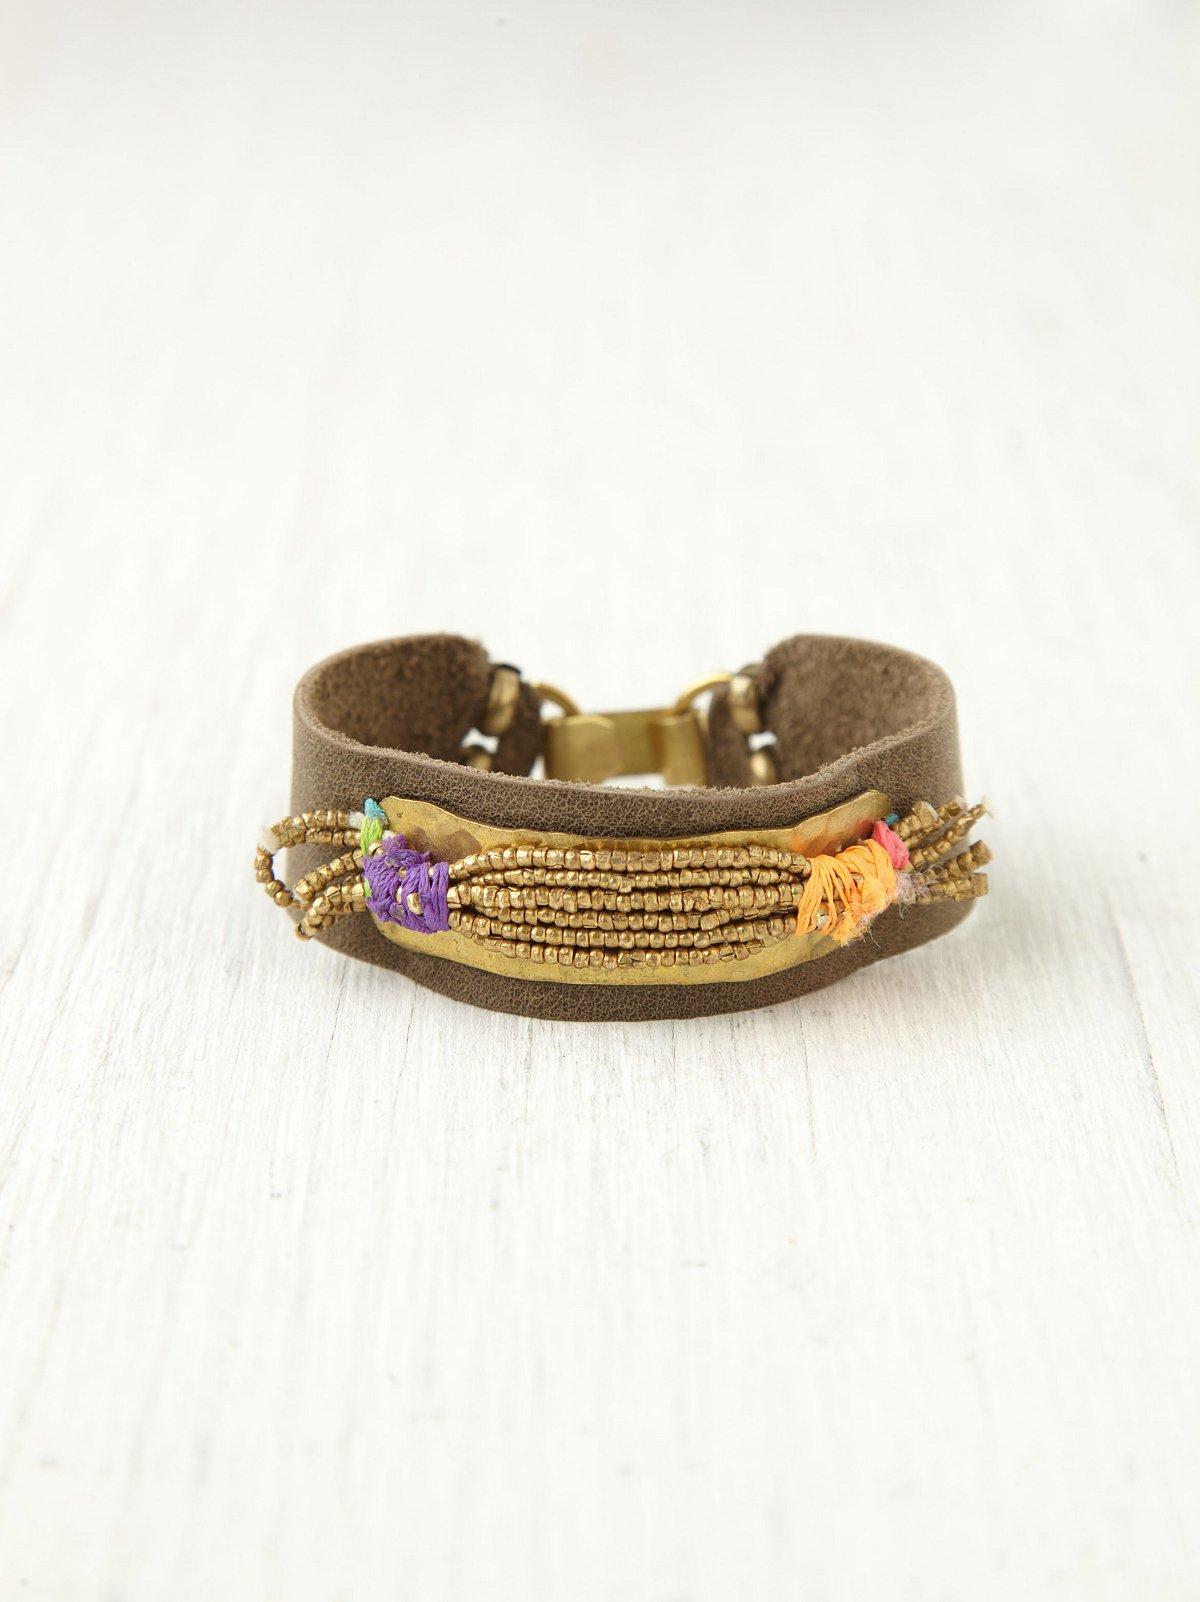 Gold Spun Leather Bracelet